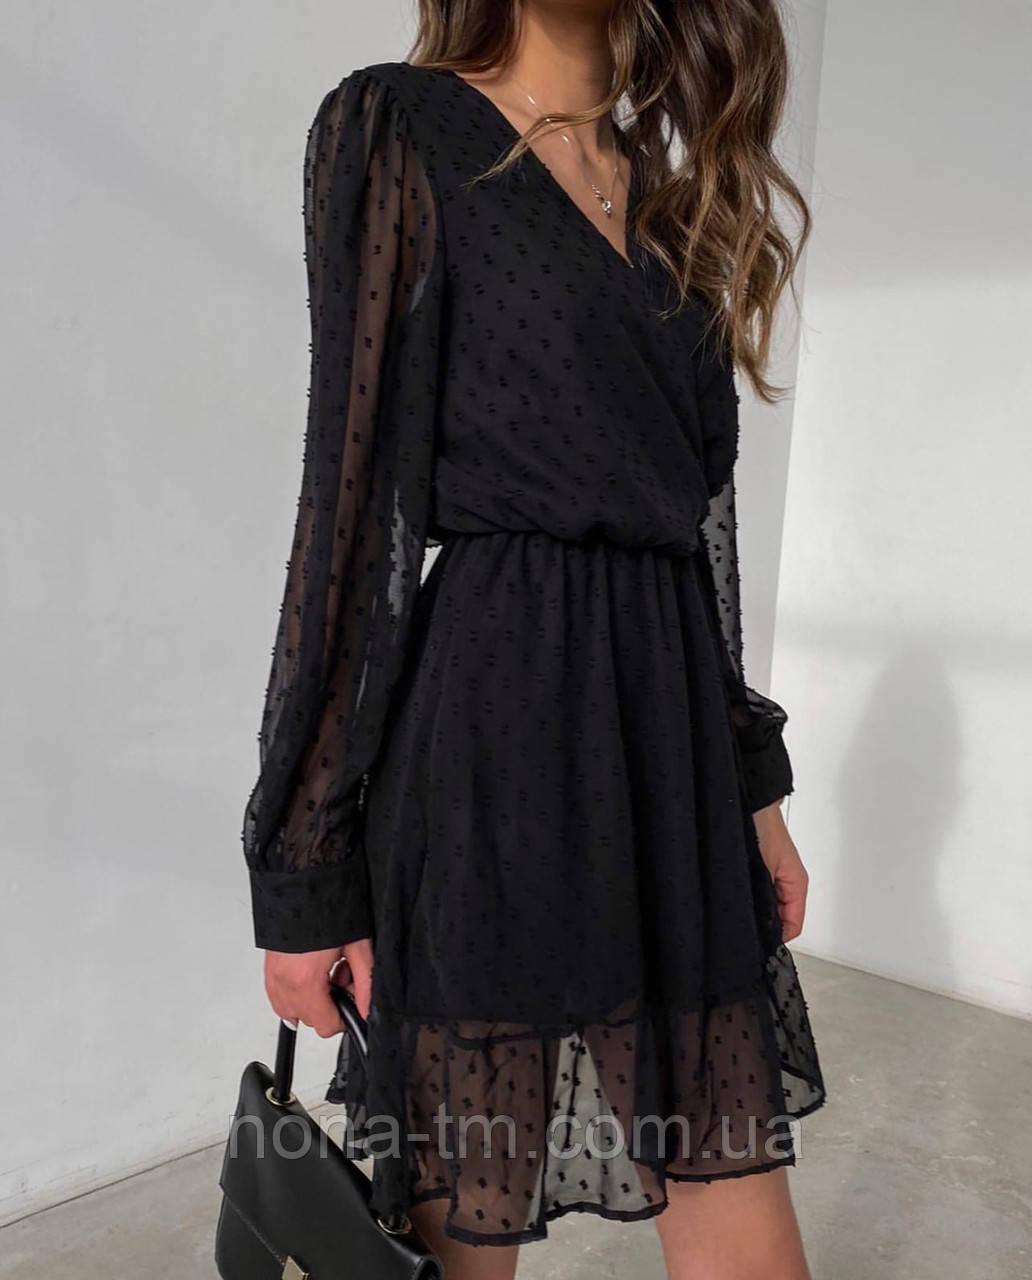 Ошатне плаття жіноче на запах (Норма, Батал)